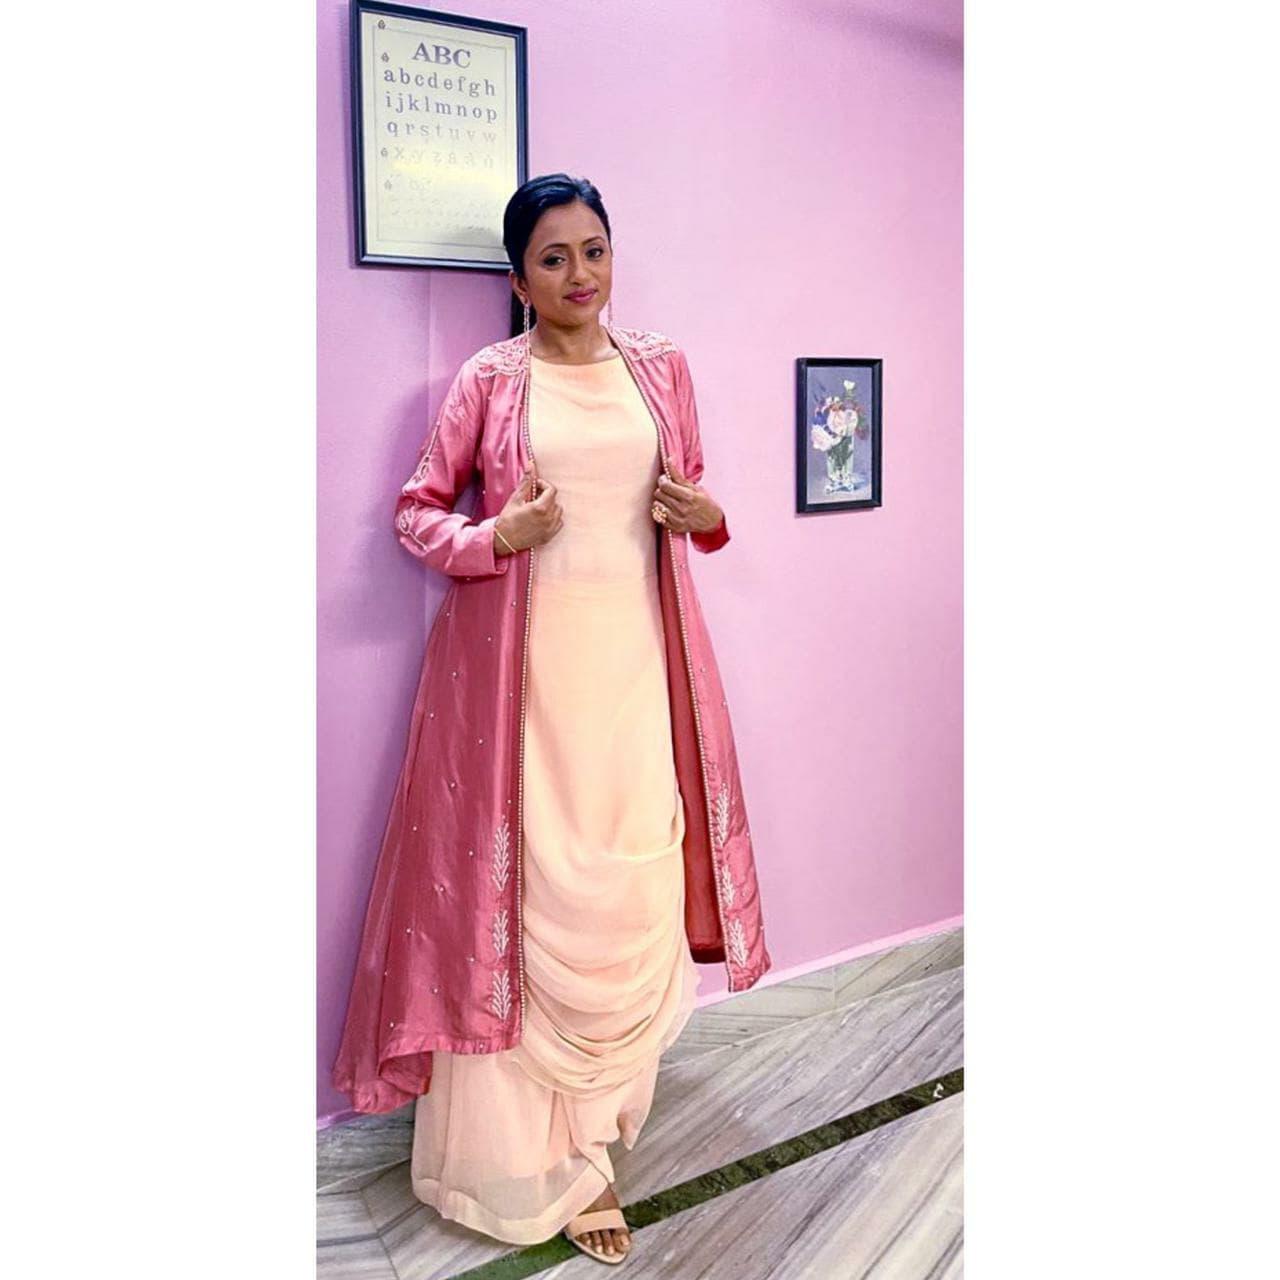 Beautiful anchor Suma Kanakala from yesterday's 'Most Eligible Bachelor' Pre-Release. Styled by Priyankasaha jananda. Outfit  : Desi Vastra. Jewlry : Kushlas fashion jewellery. 2021-10-09